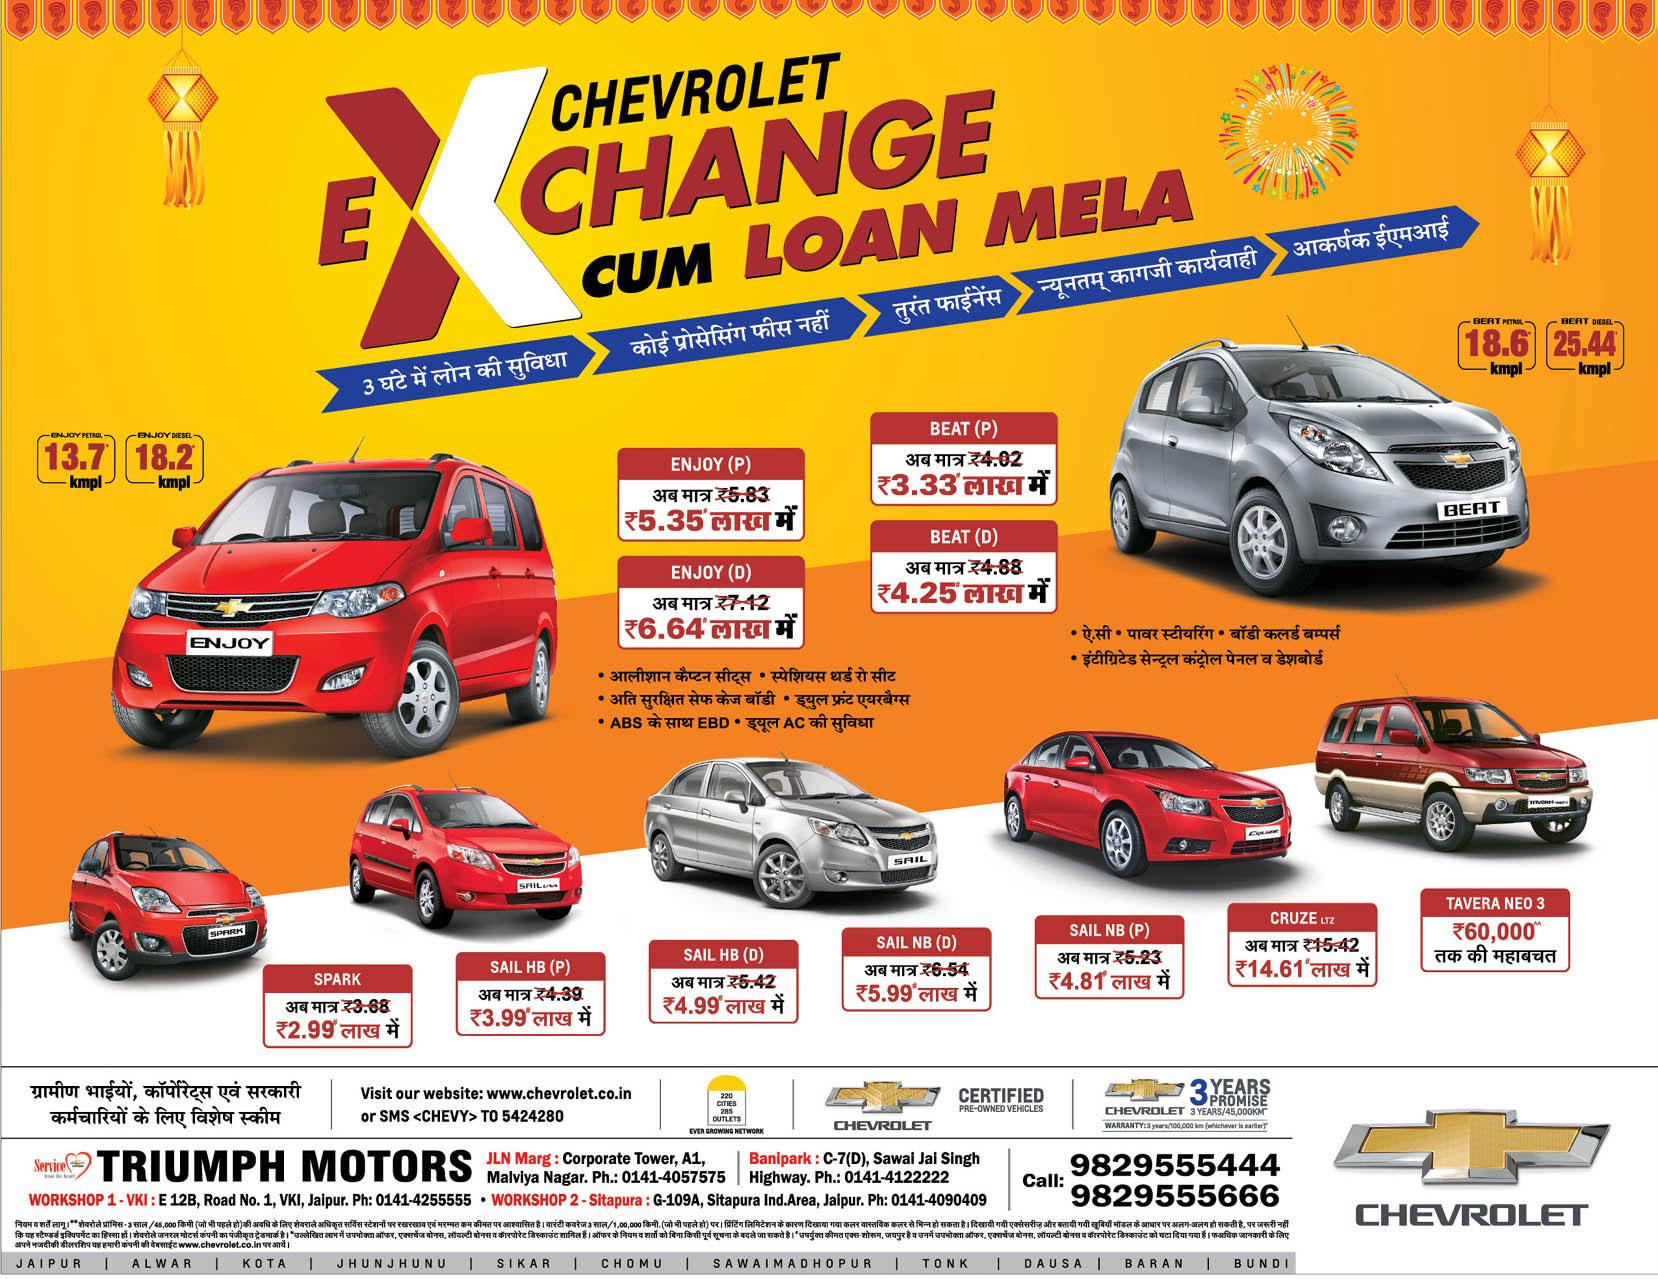 Best part exchange deals on cars